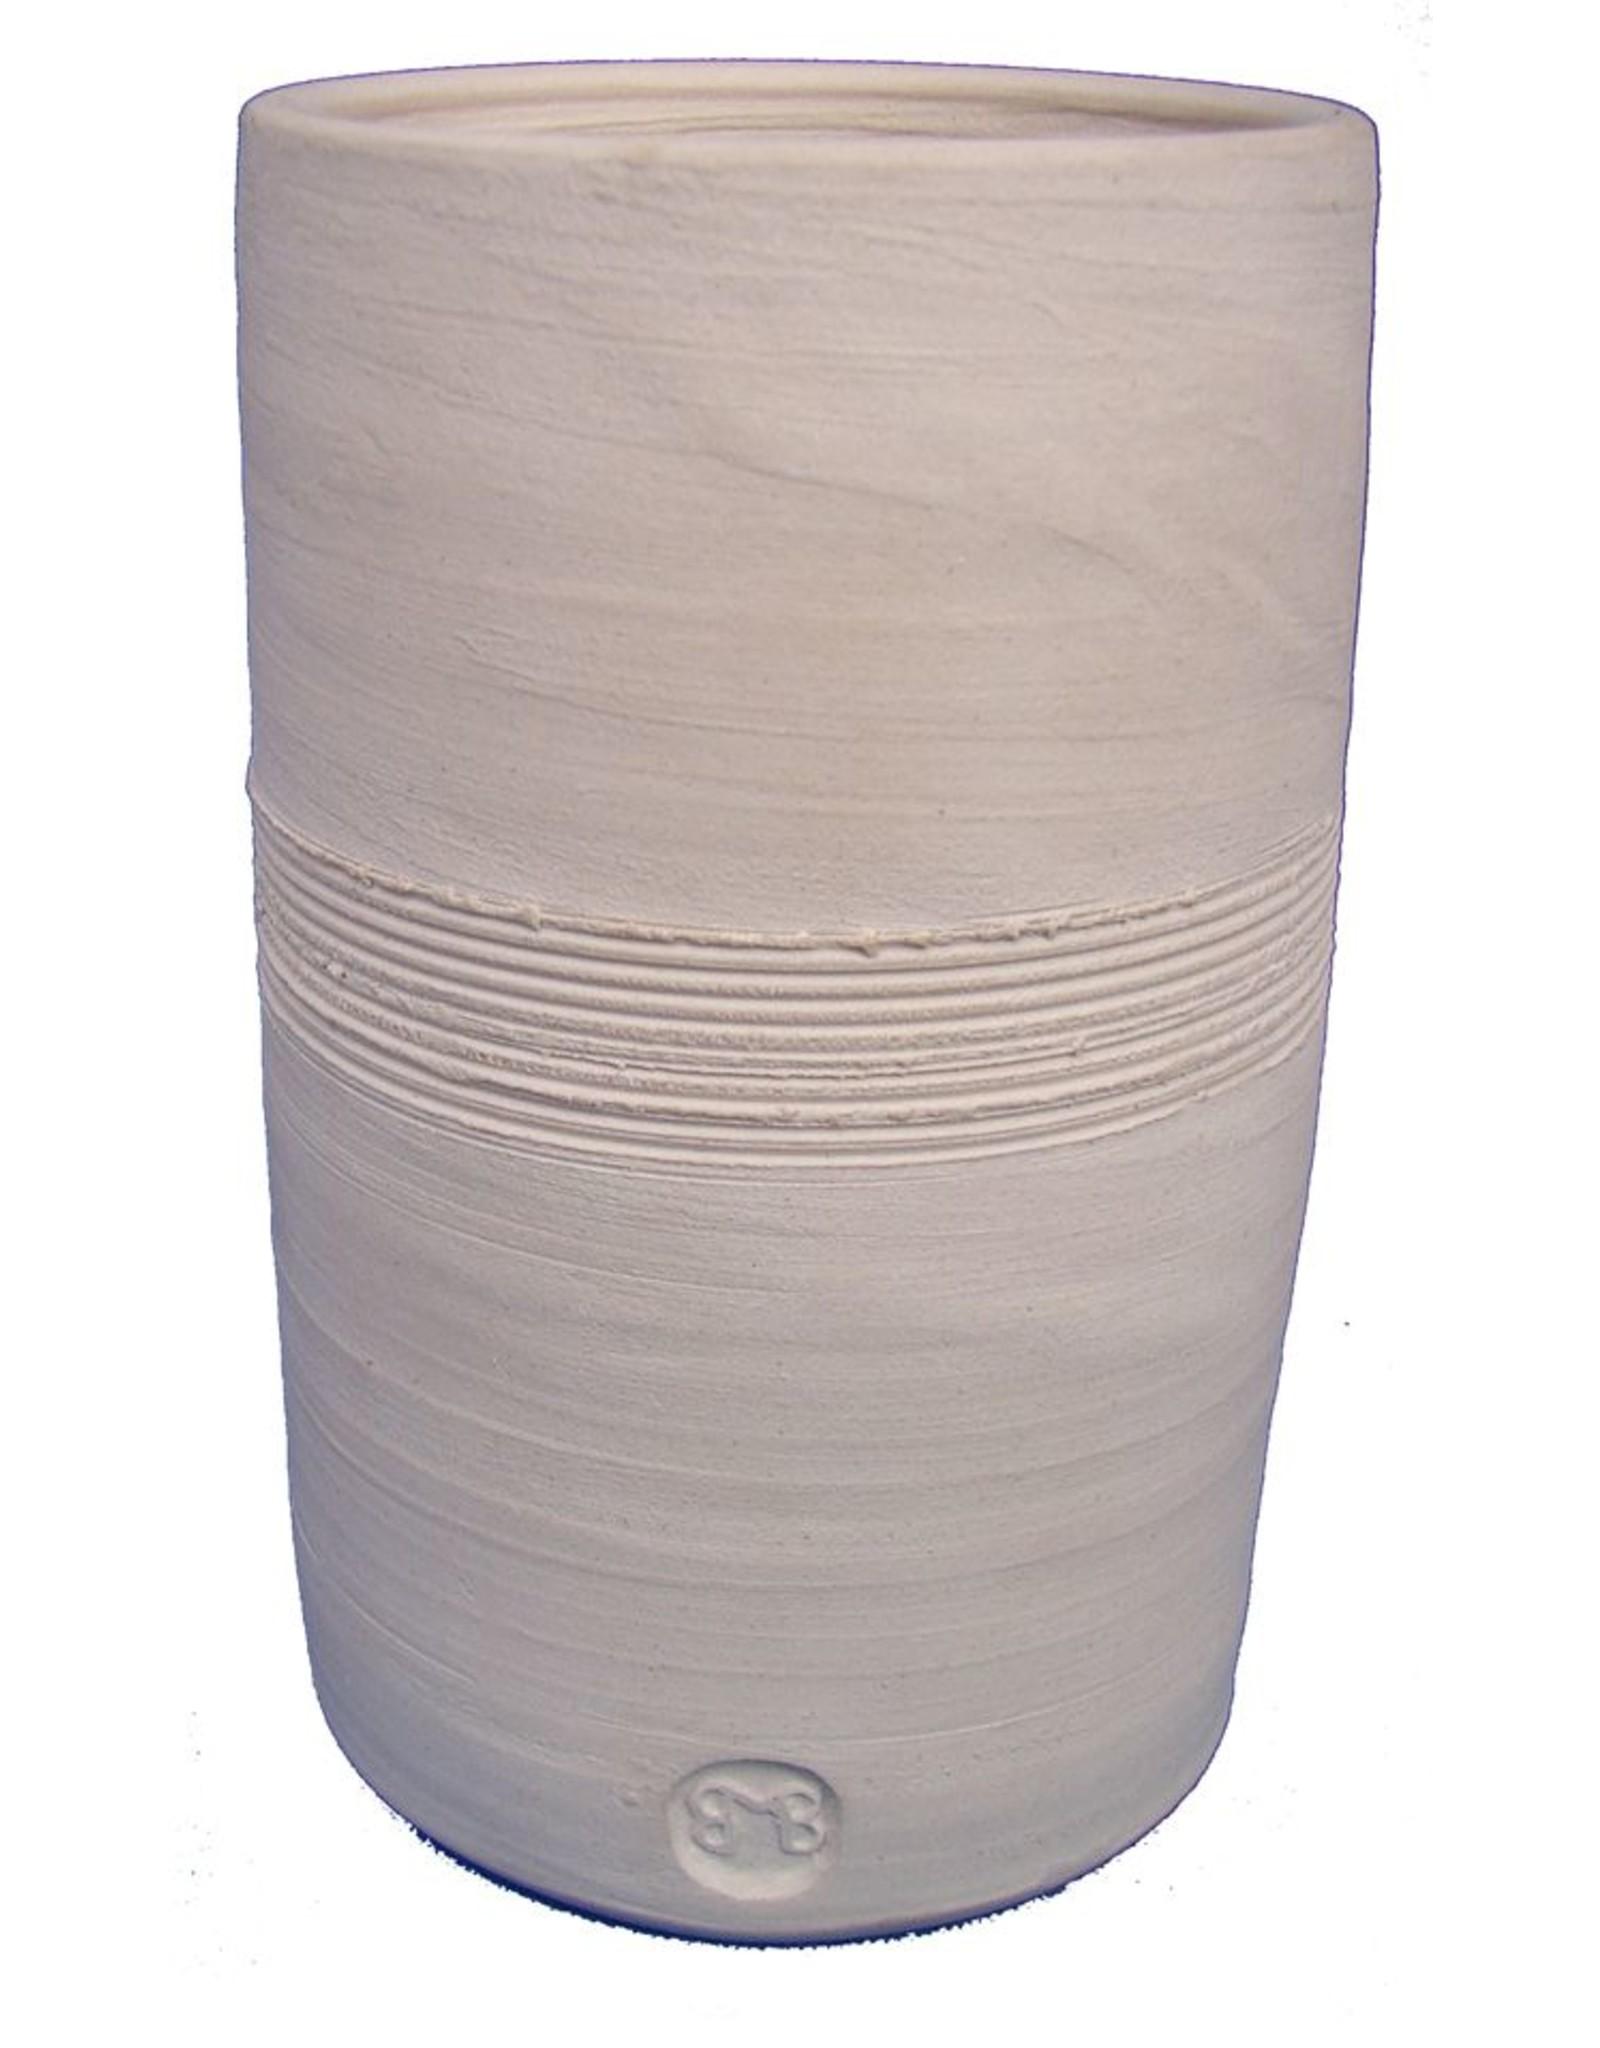 Potclays 1145 White Stoneware (Firing Range 1200˚C-1300˚C) - 12.5kg